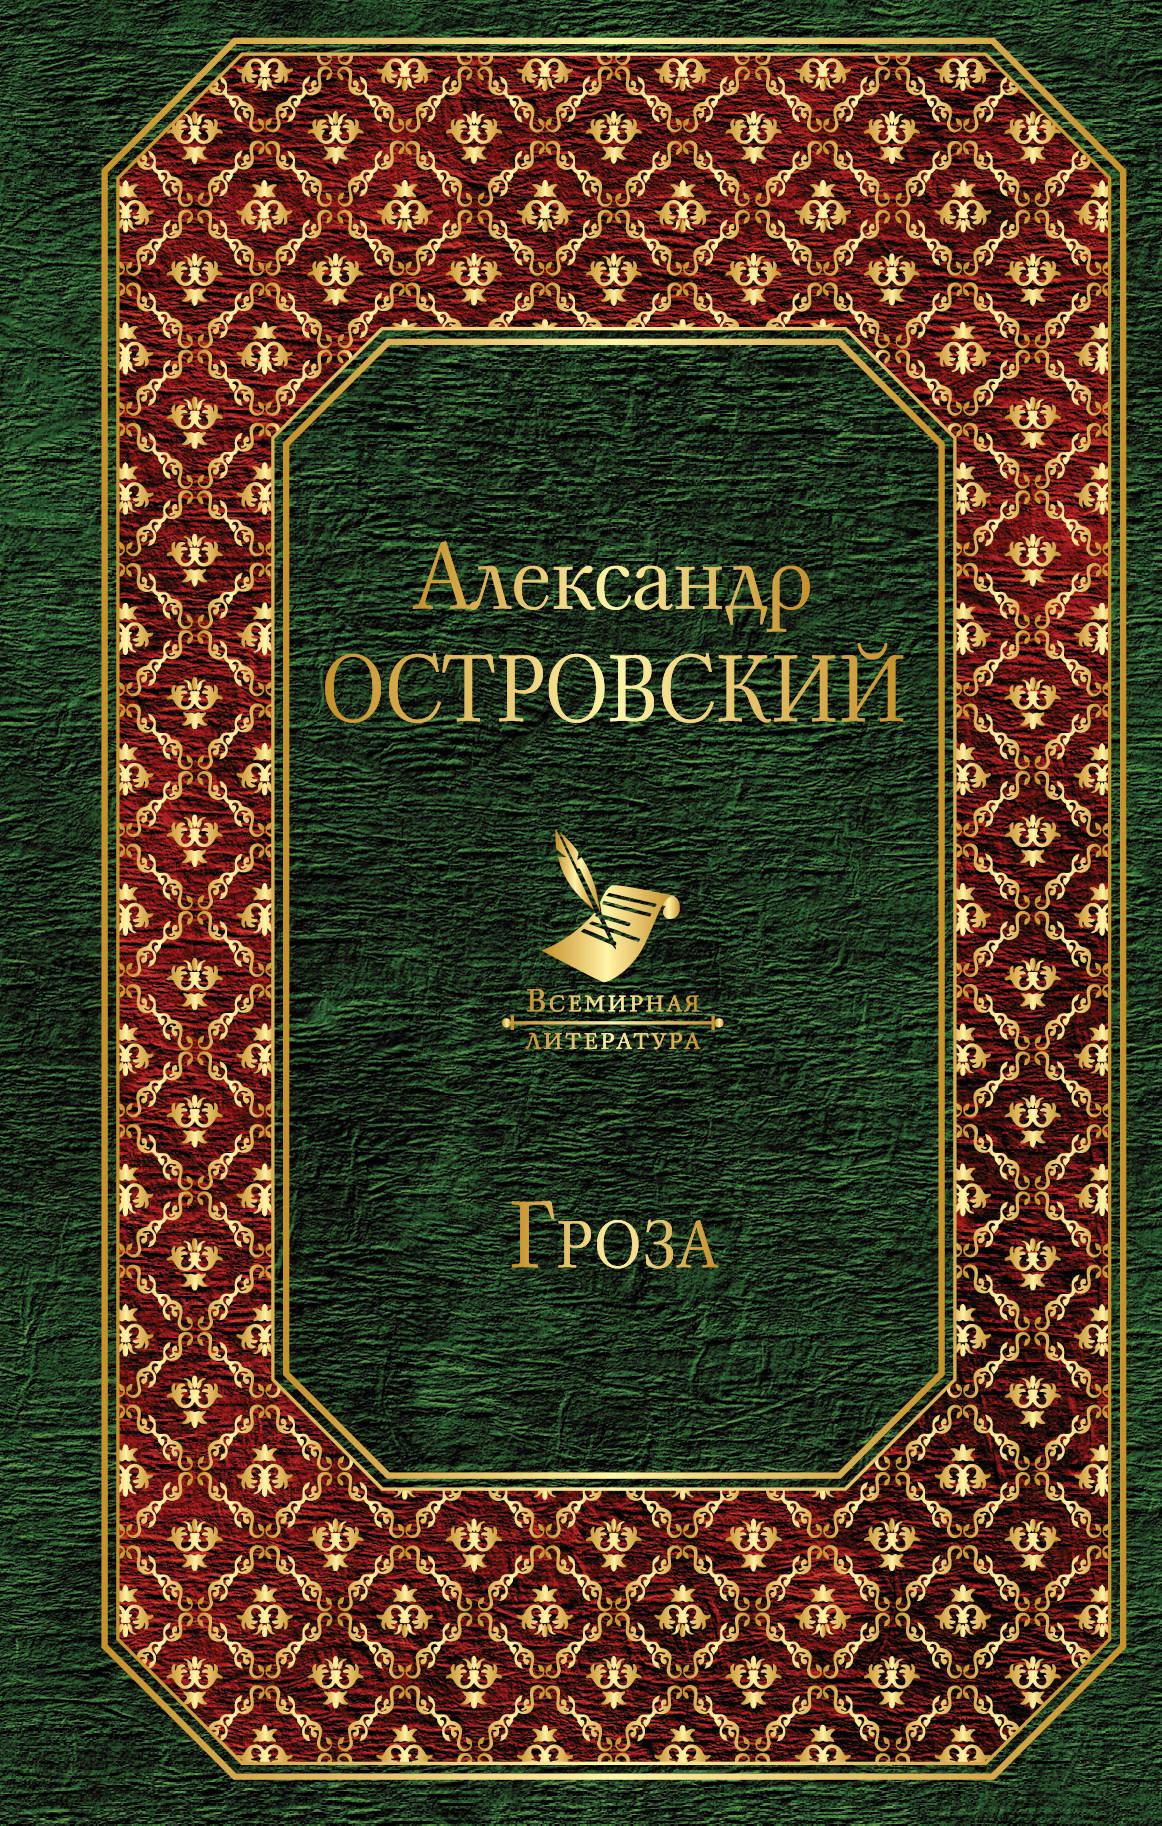 Александр Островский Гроза набор шкатулок для рукоделия bestex 3 шт zw001250